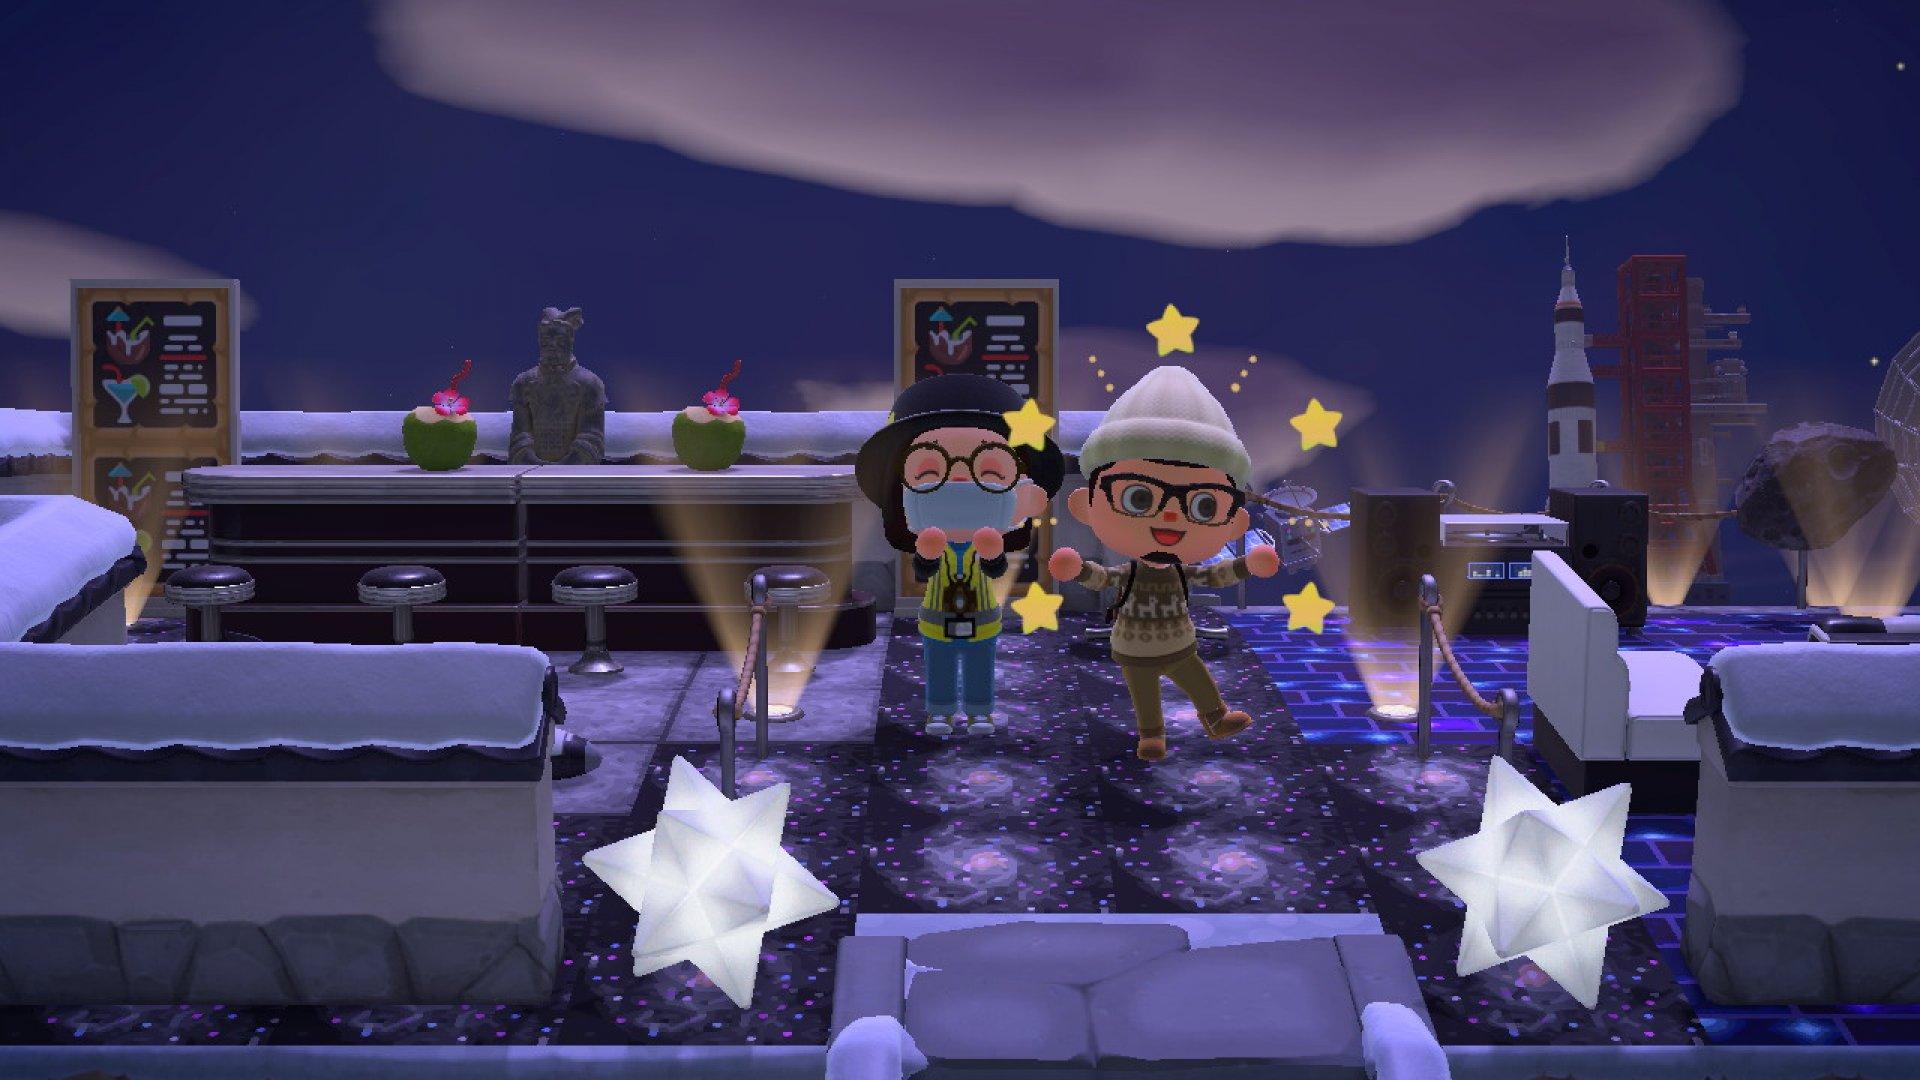 Becca Laurenson vists Chris Lee's Animal Crossing New Horizons island on Feb. 11. | Screenshot by Becca Laurenson